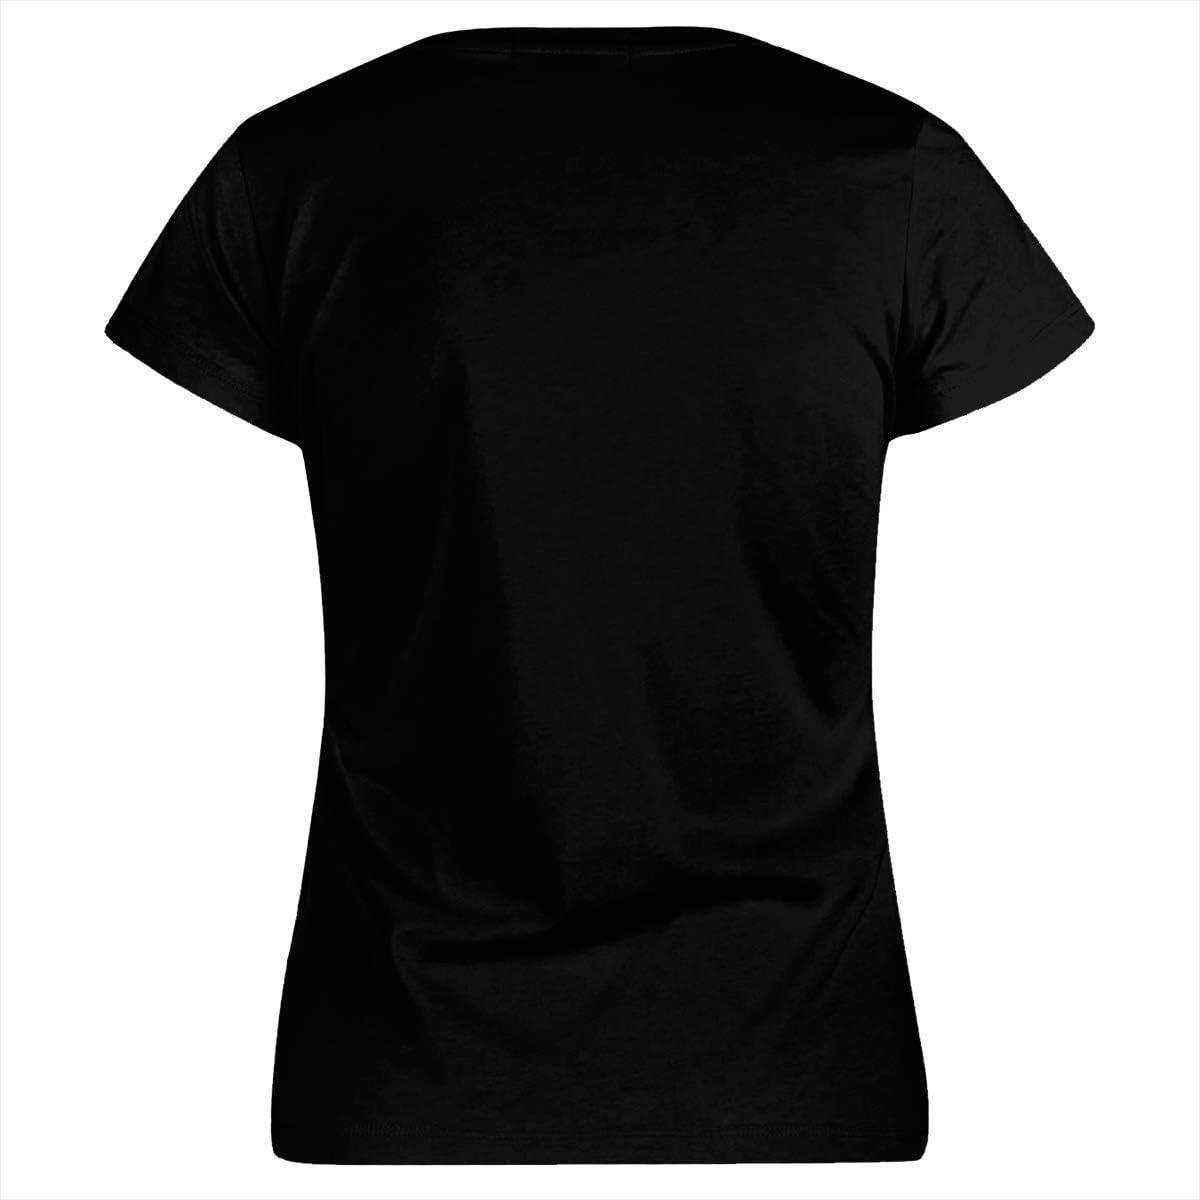 Mars Attacks T Shirt Tee Shirt Girl Summer Short Sleeve Round Neck Tops Funny Tee